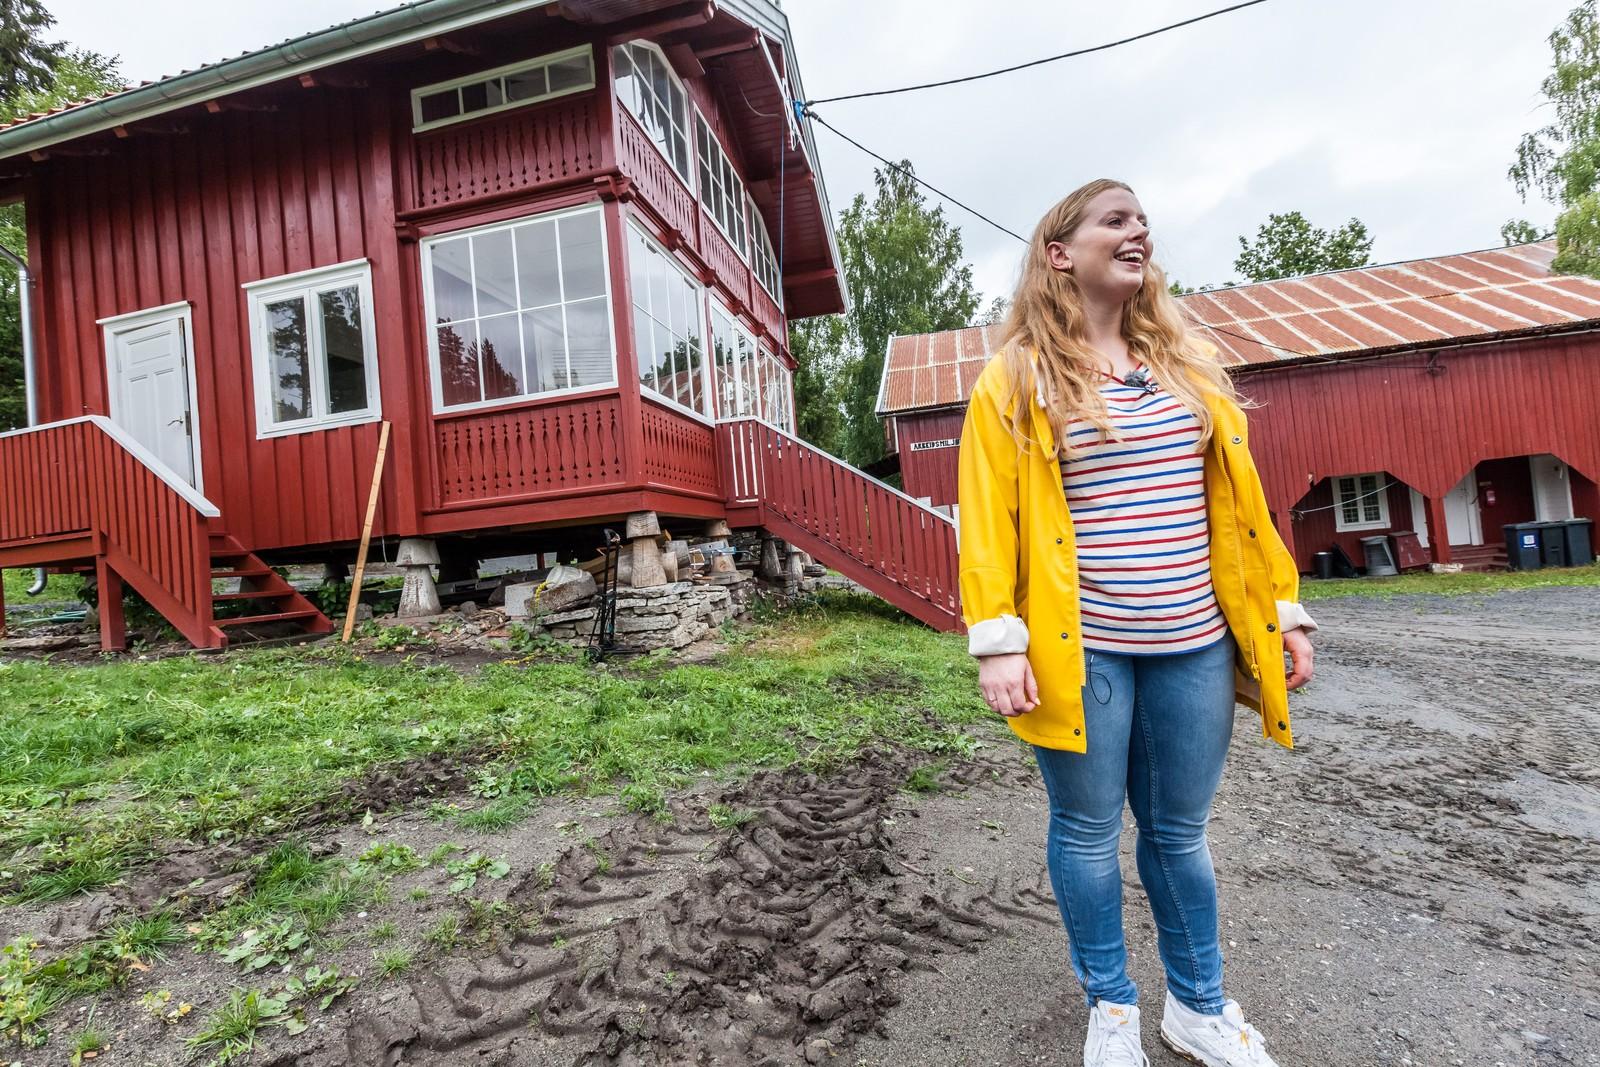 Nestleder i AUF Emilie Bersaas, tok pressen med på omvisning på nye Utøya.